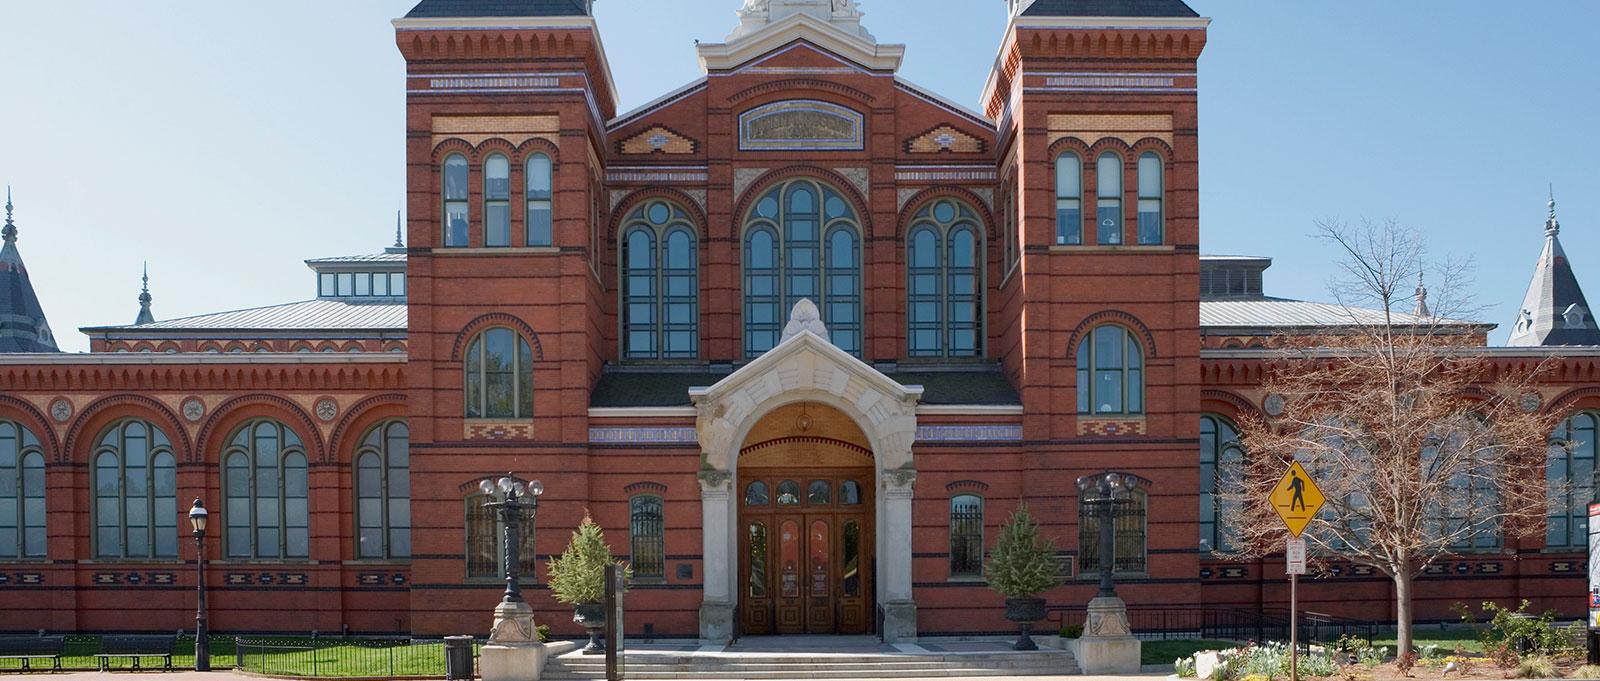 The Smithsonian Institution at Washington, DC